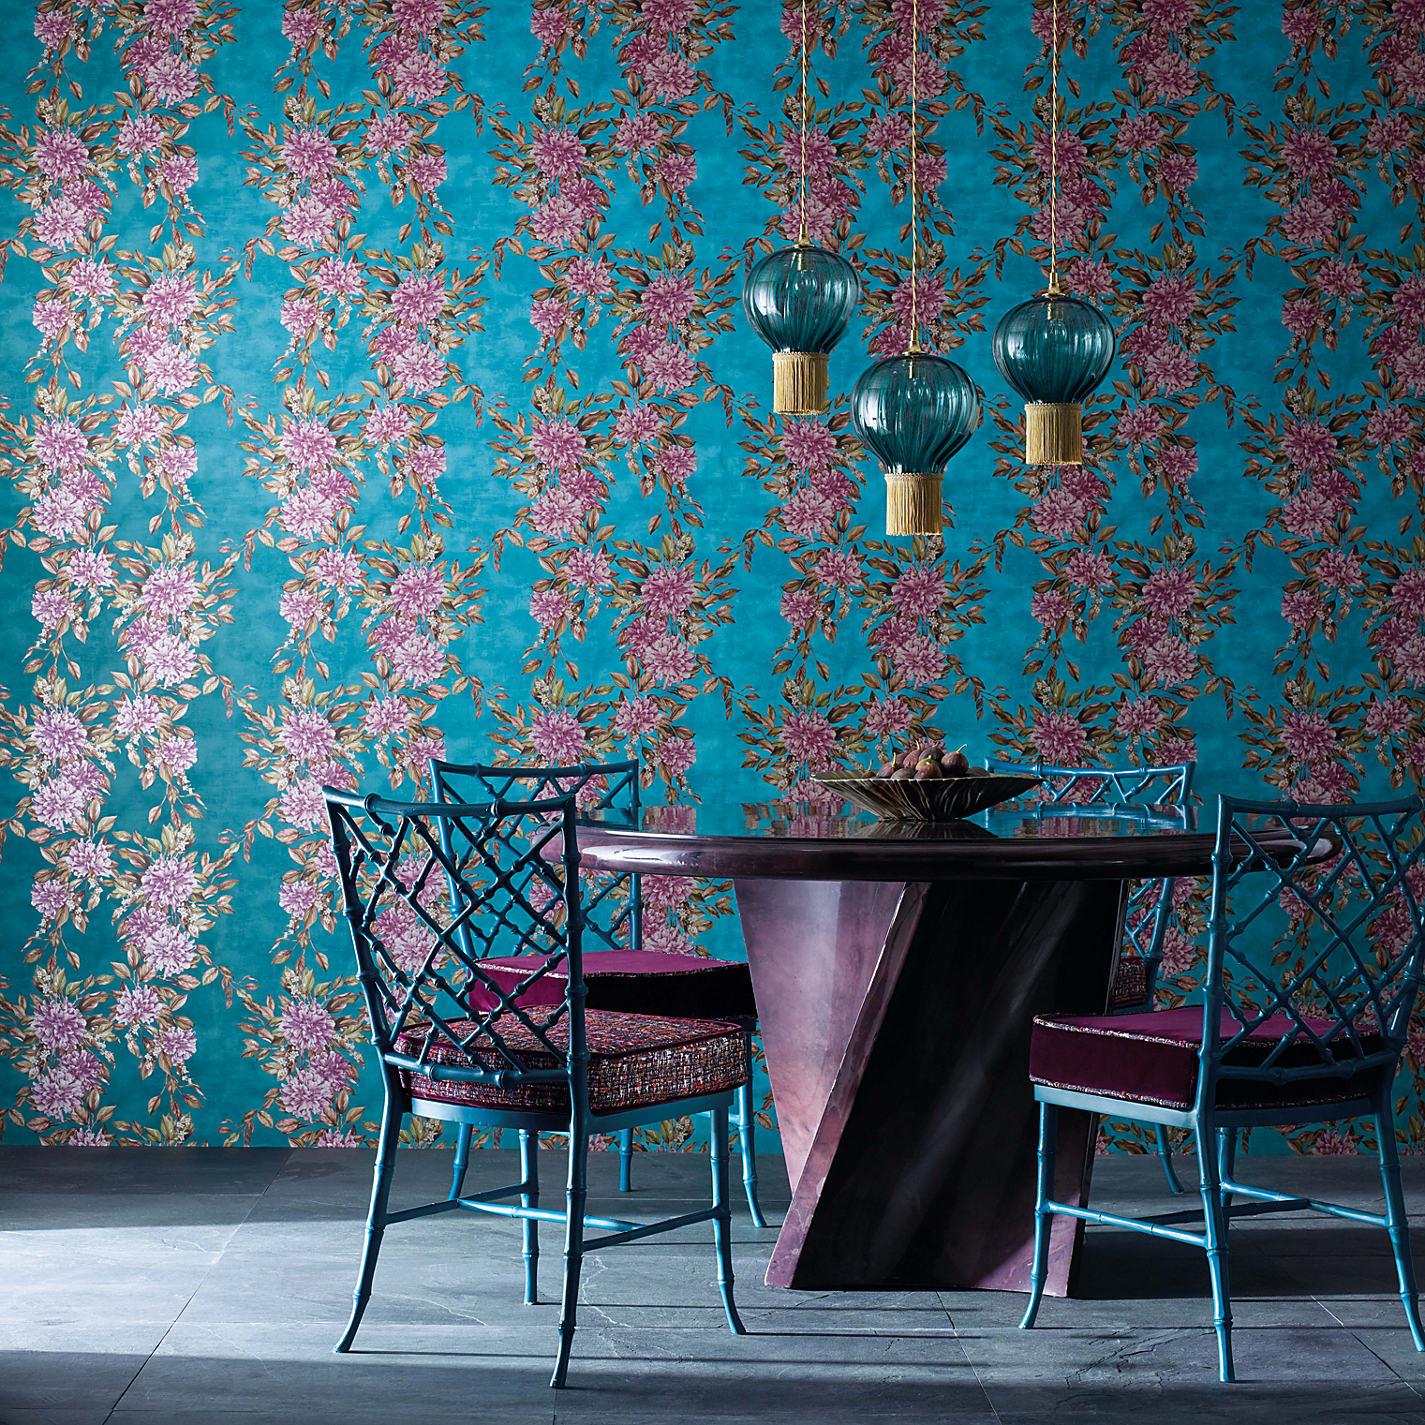 osborne little enchanted gardens rhodora page 14 w7022 05. Black Bedroom Furniture Sets. Home Design Ideas